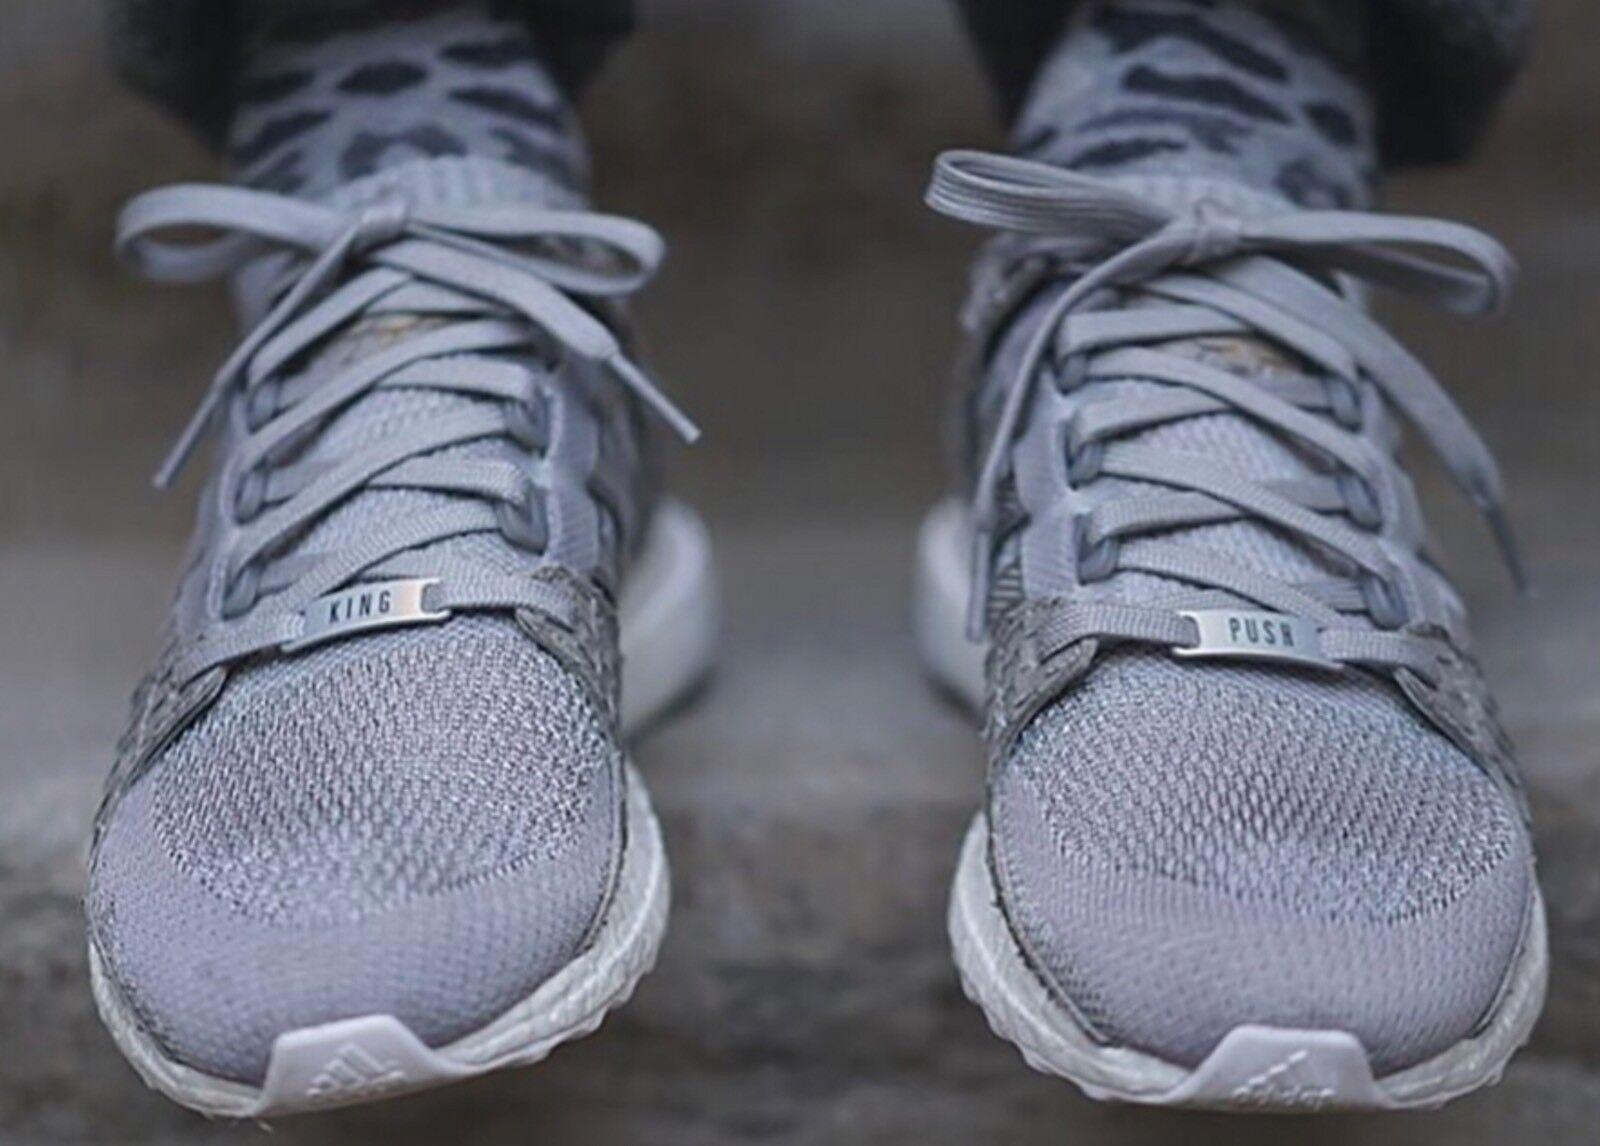 DS Adidas EQT SUPPORT ULTRA PRIMEKNIT PUSH PUSHA T STONE KING PUSH S76777 SZ 7